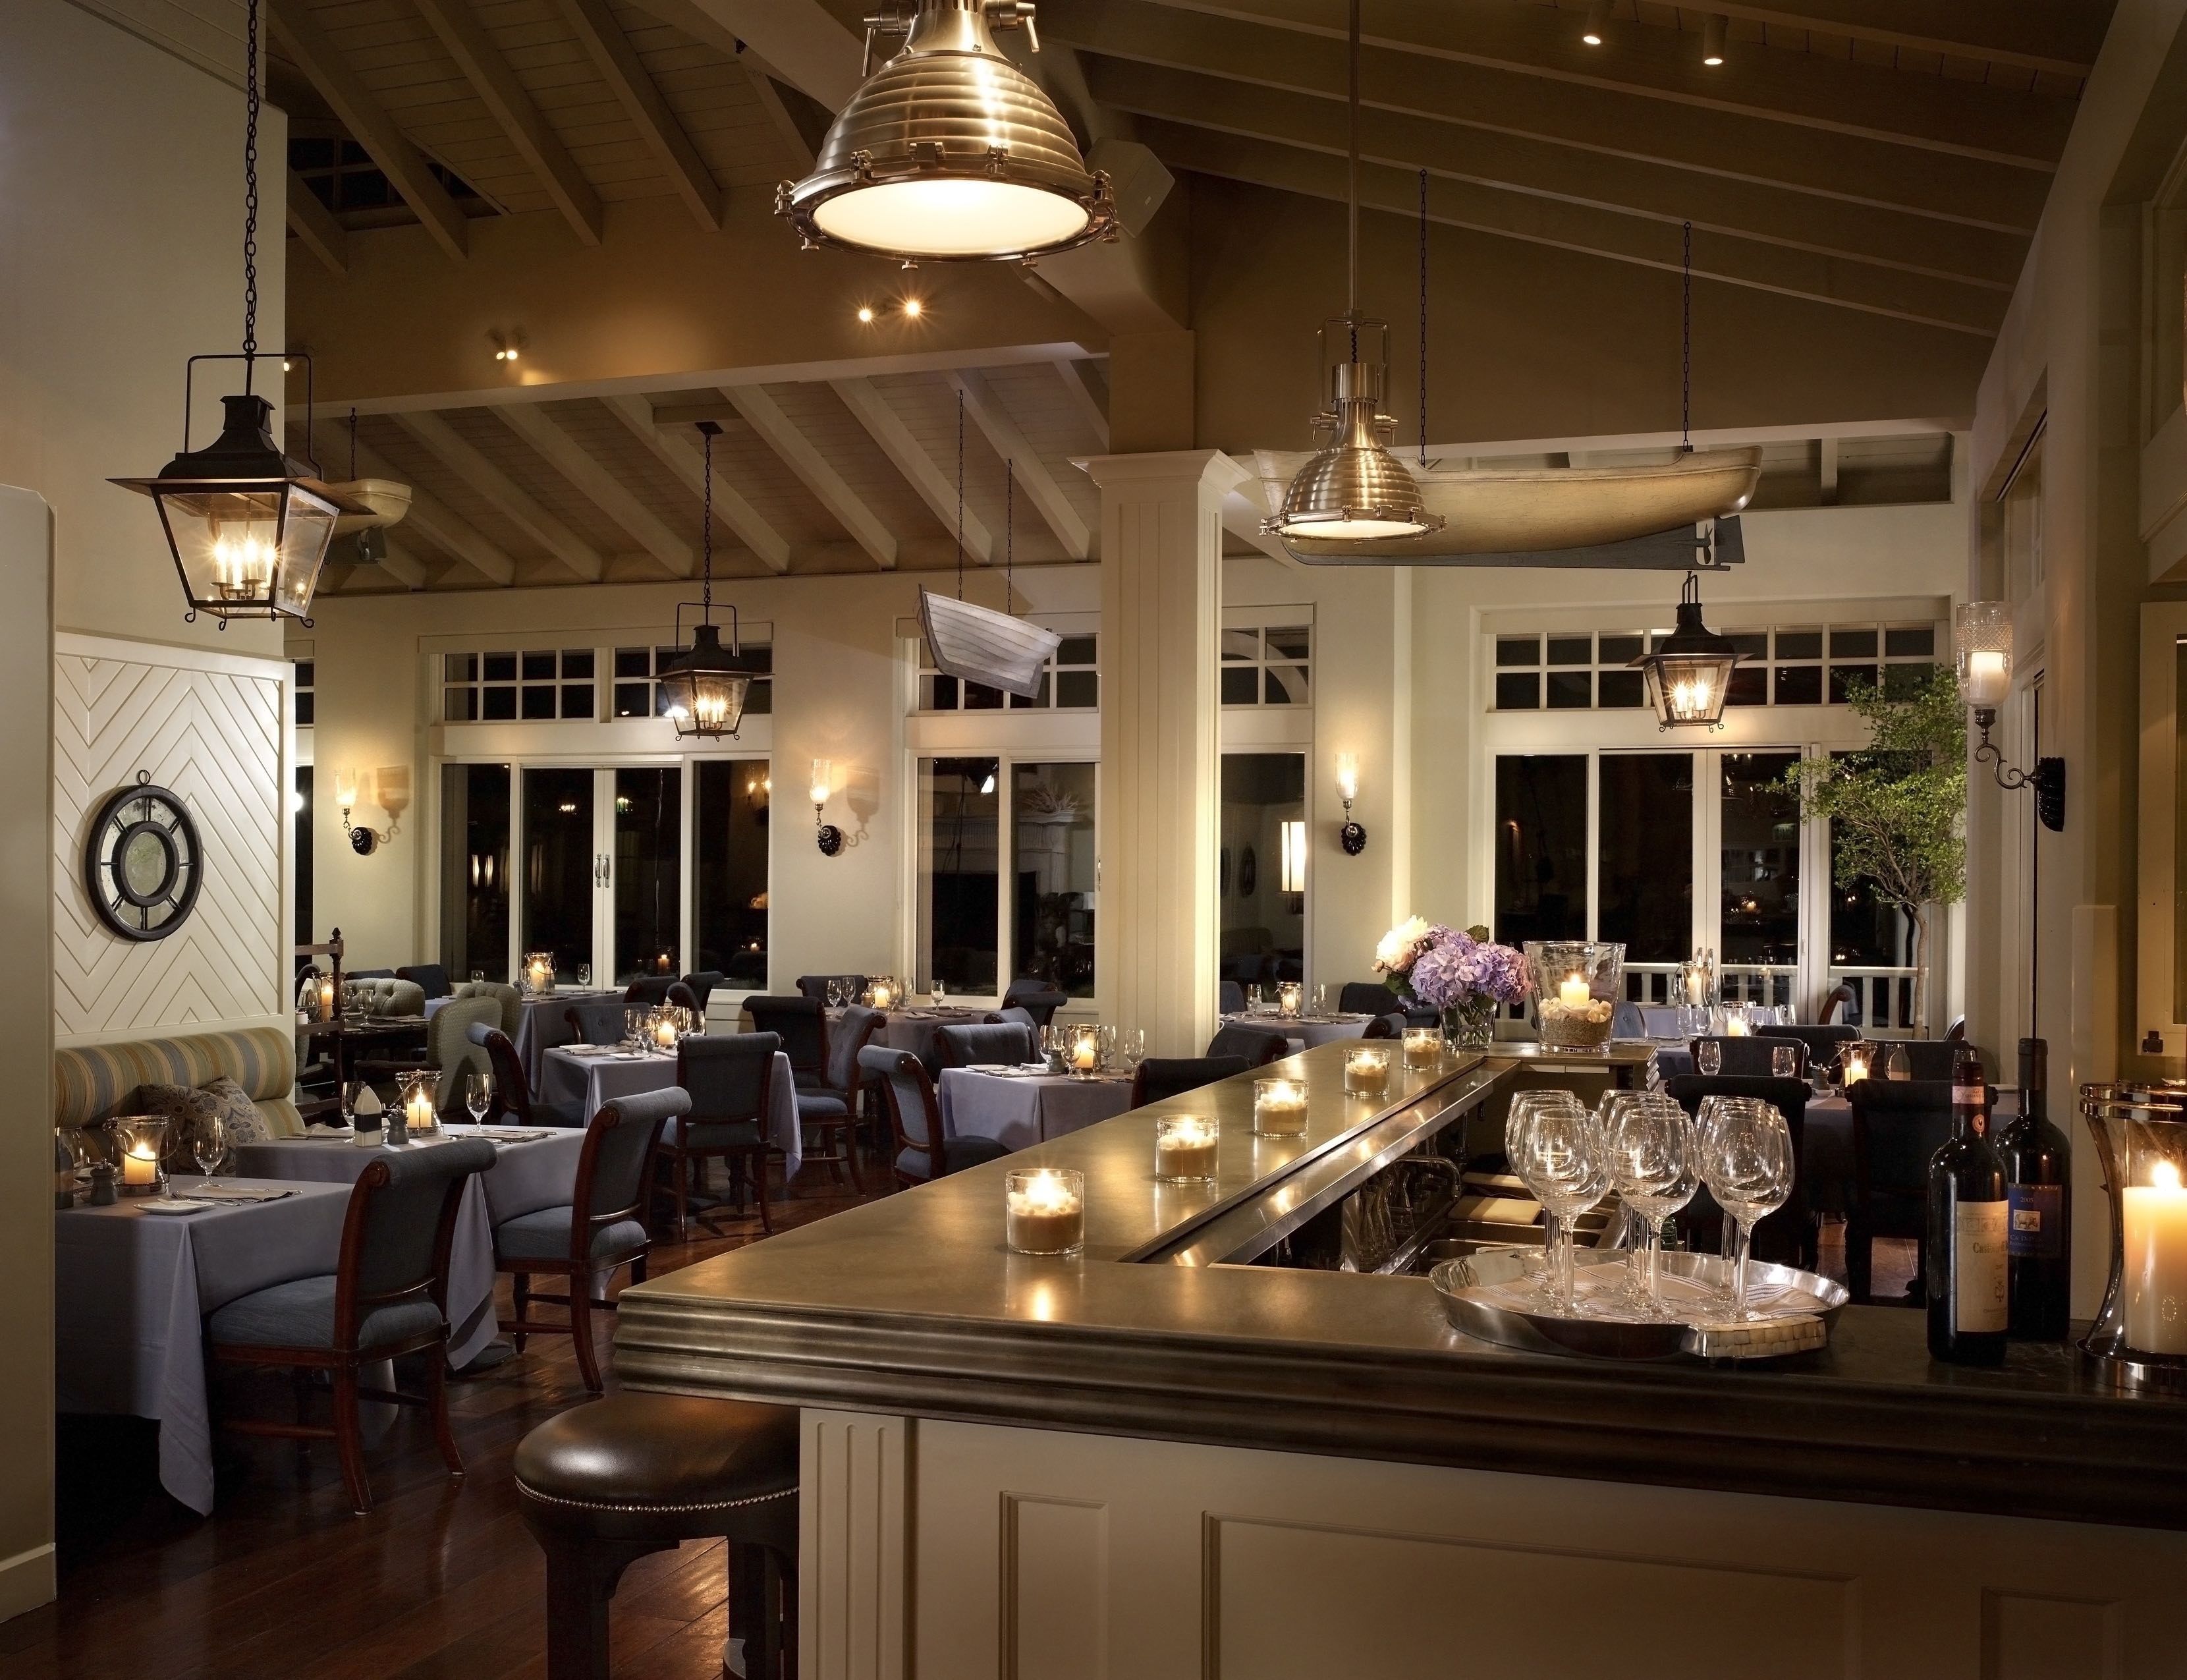 santa monica hotel - luxury beach hotel | the iconic shutters on